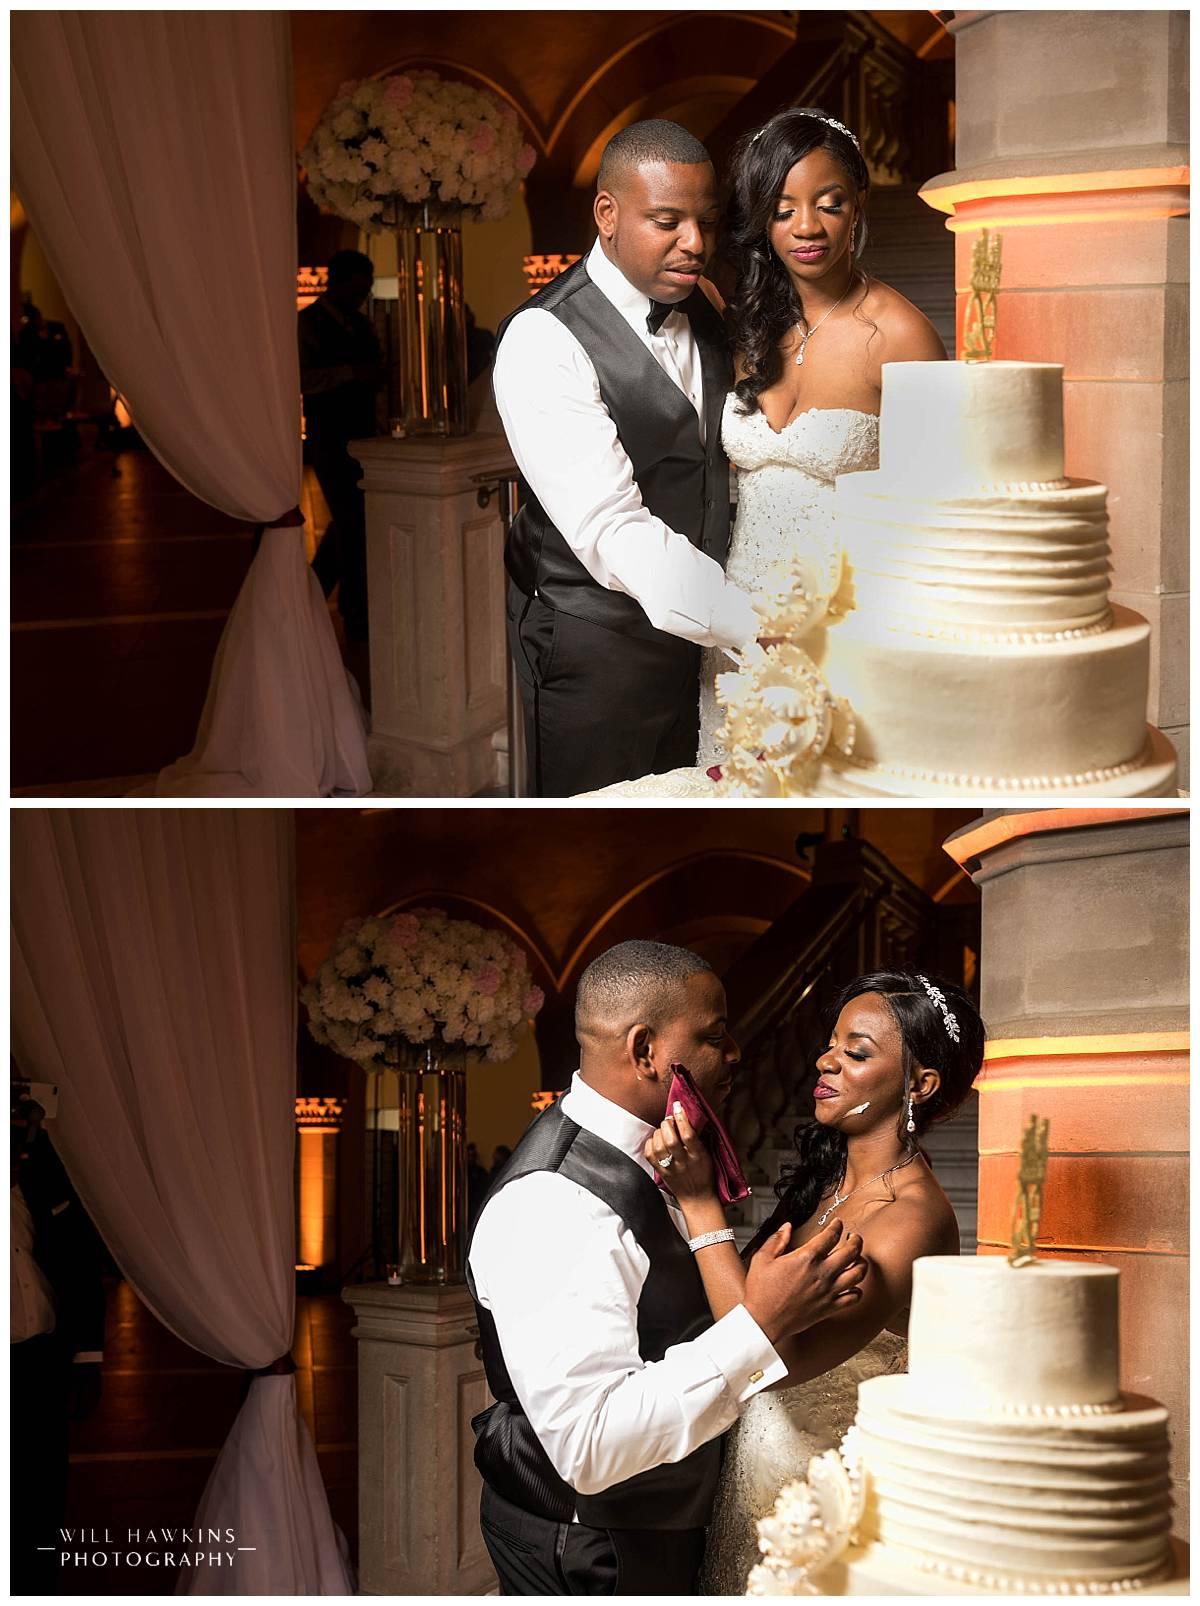 2018-12-10_0031.jpgChrysler Museum of Art Wedding Will Hawkins Photography Virginia Wedding Photography Virginia Wedding Photography Virginia Beach Wedding Photographer Norfolk Wedding